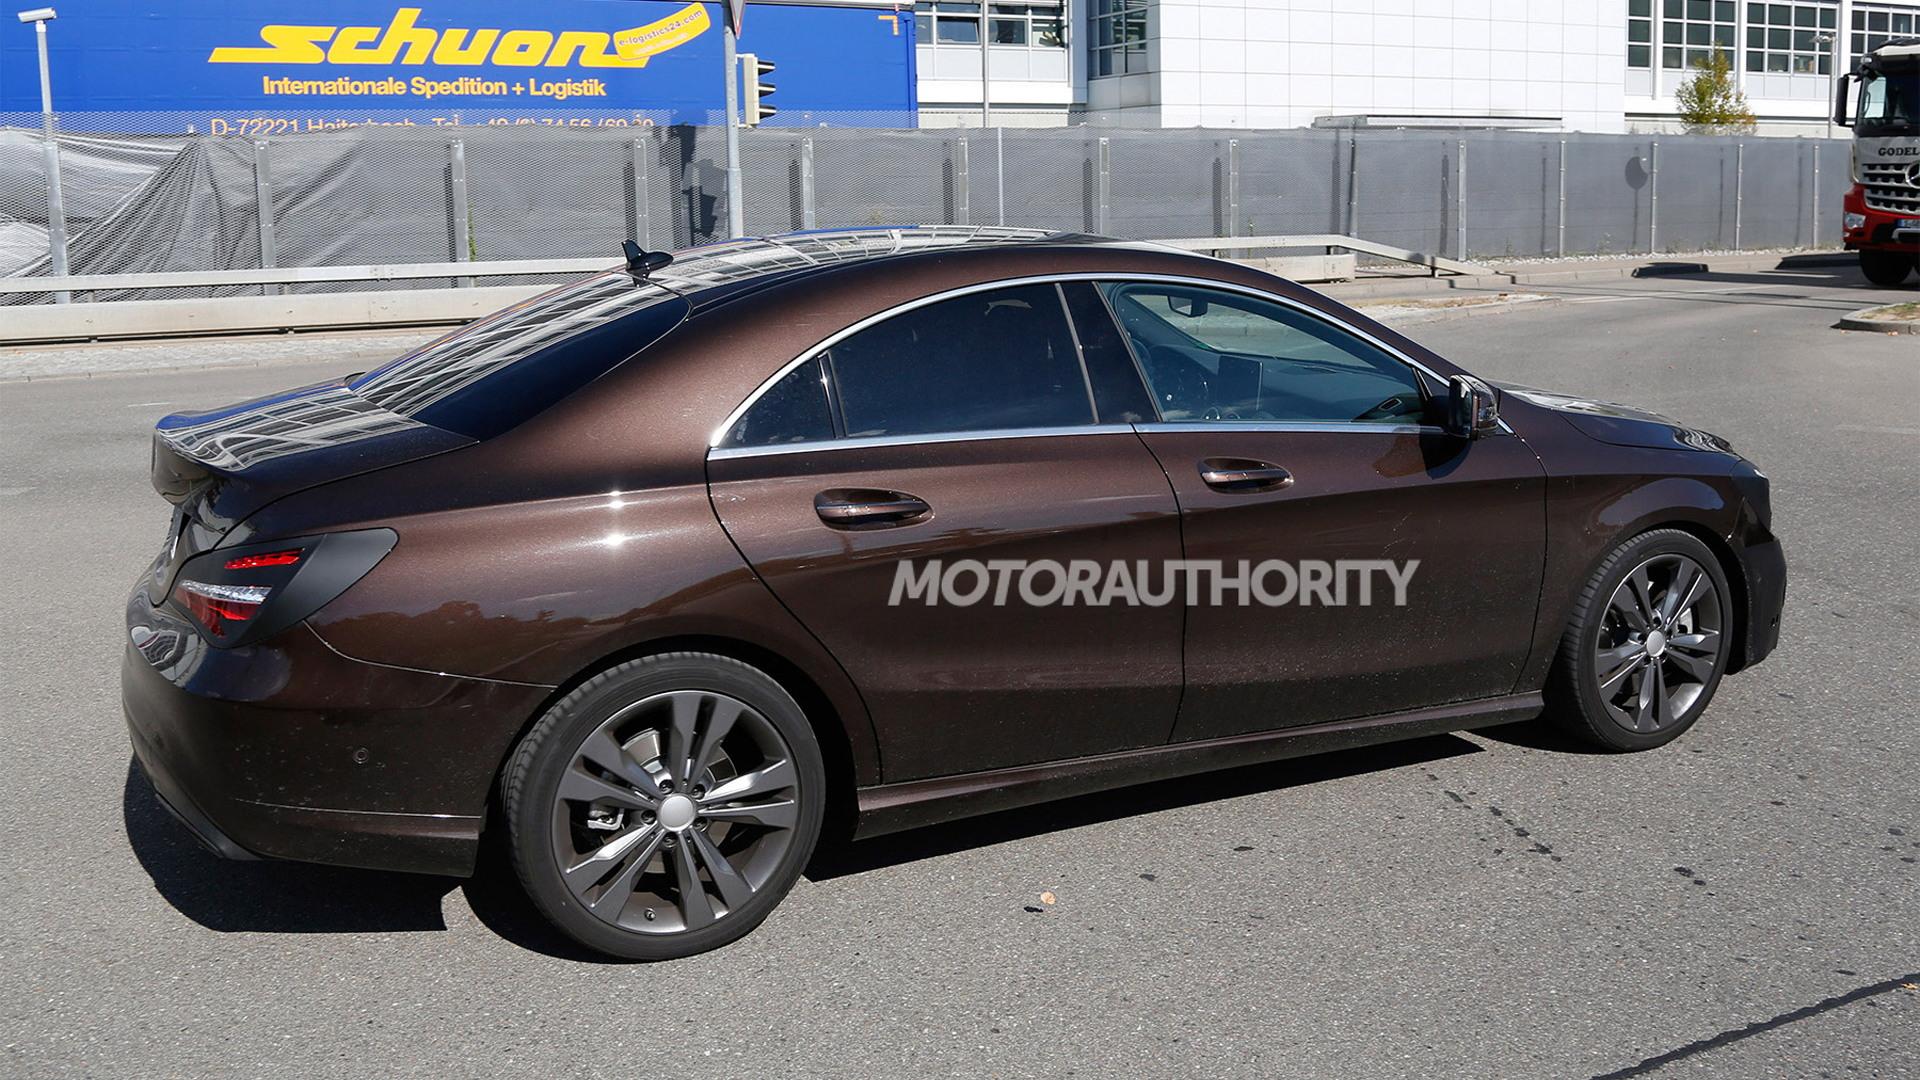 2017 Mercedes-Benz CLA-Class facelift spy shots - Image via S. Baldauf/SB-Medien